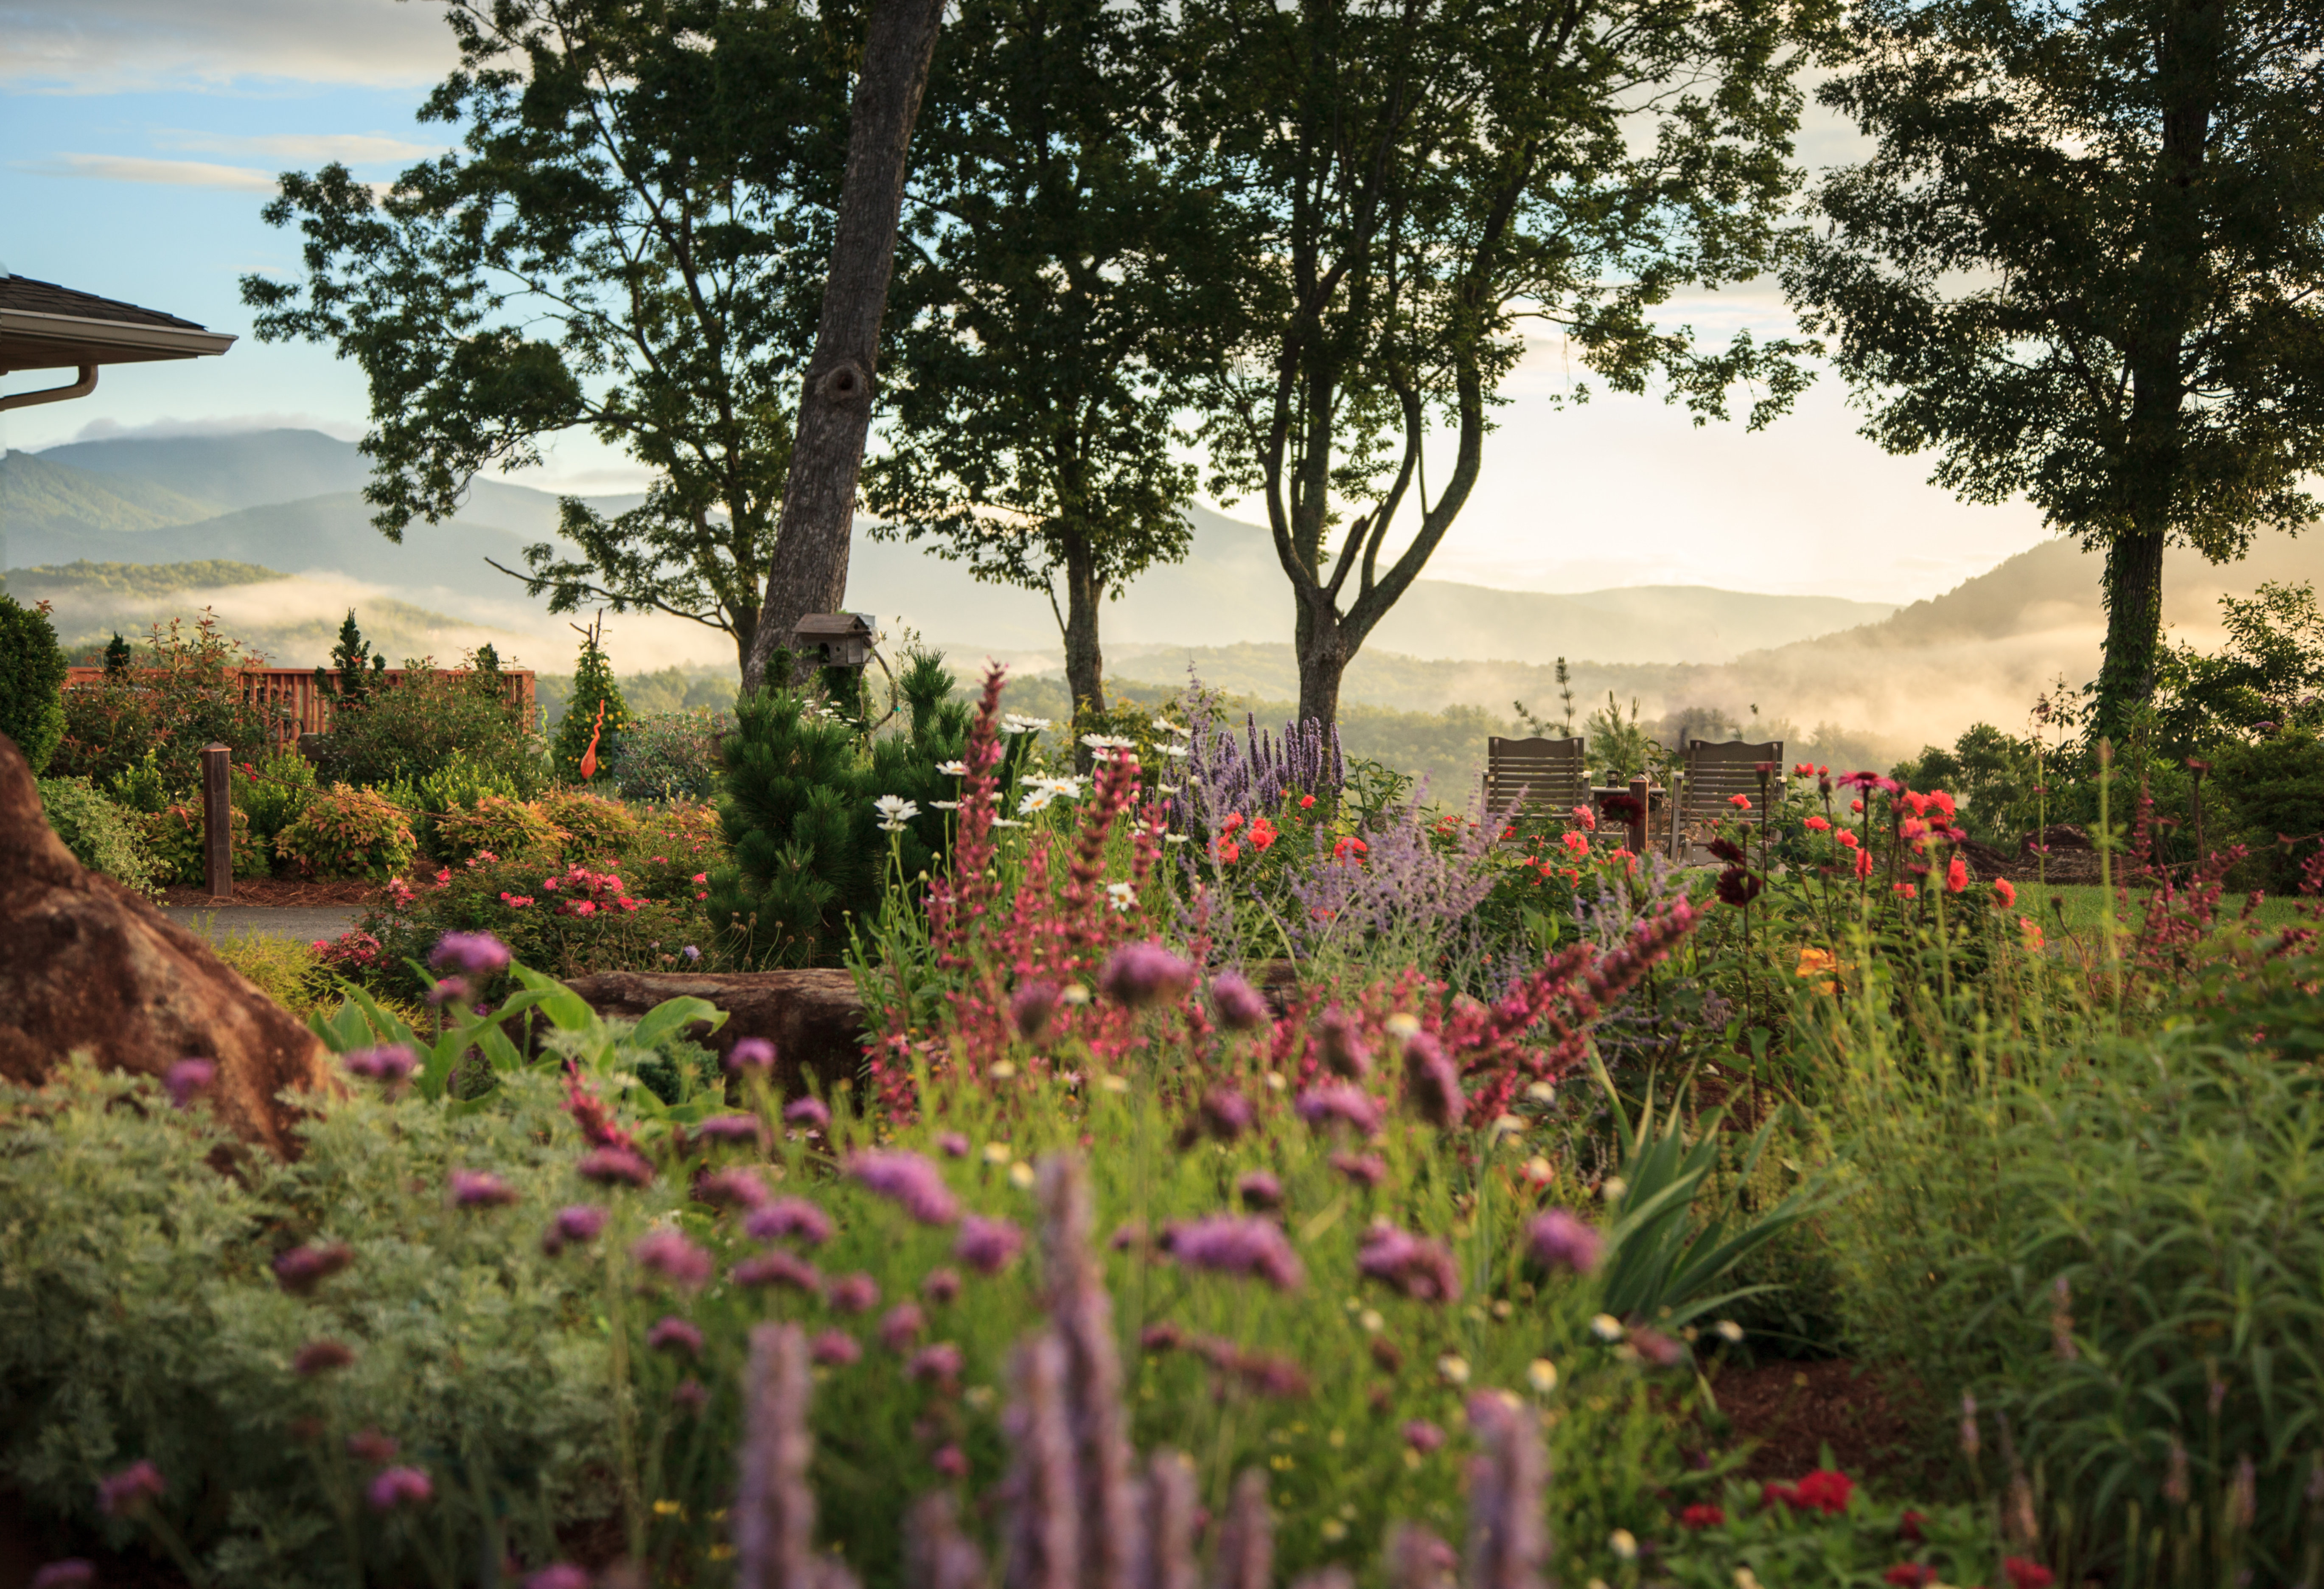 A close up of a flower garden at Lucille's Mountain Top Inn & Spa.